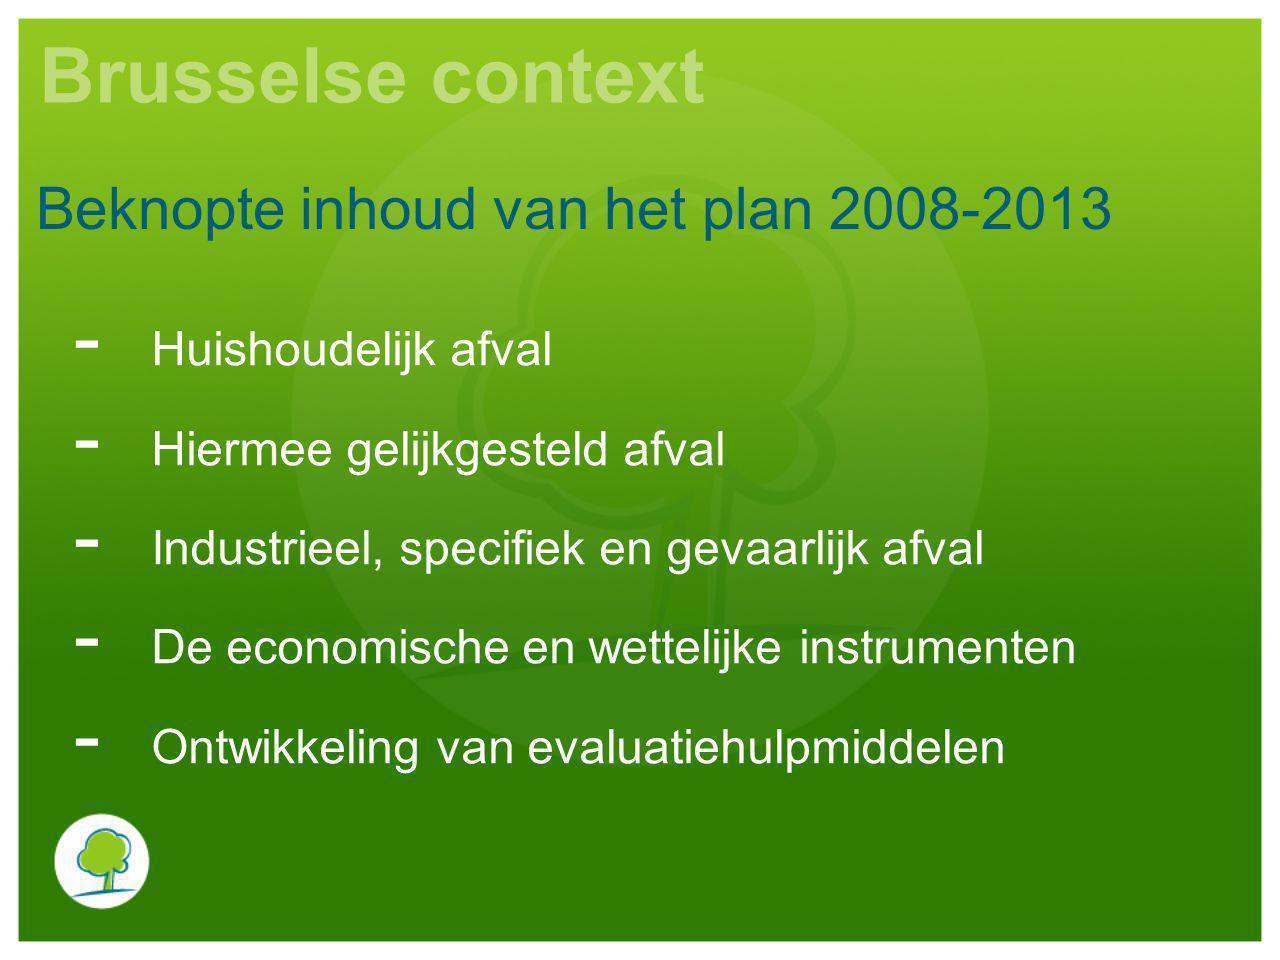 Brusselse context Beknopte inhoud van het plan 2008-2013